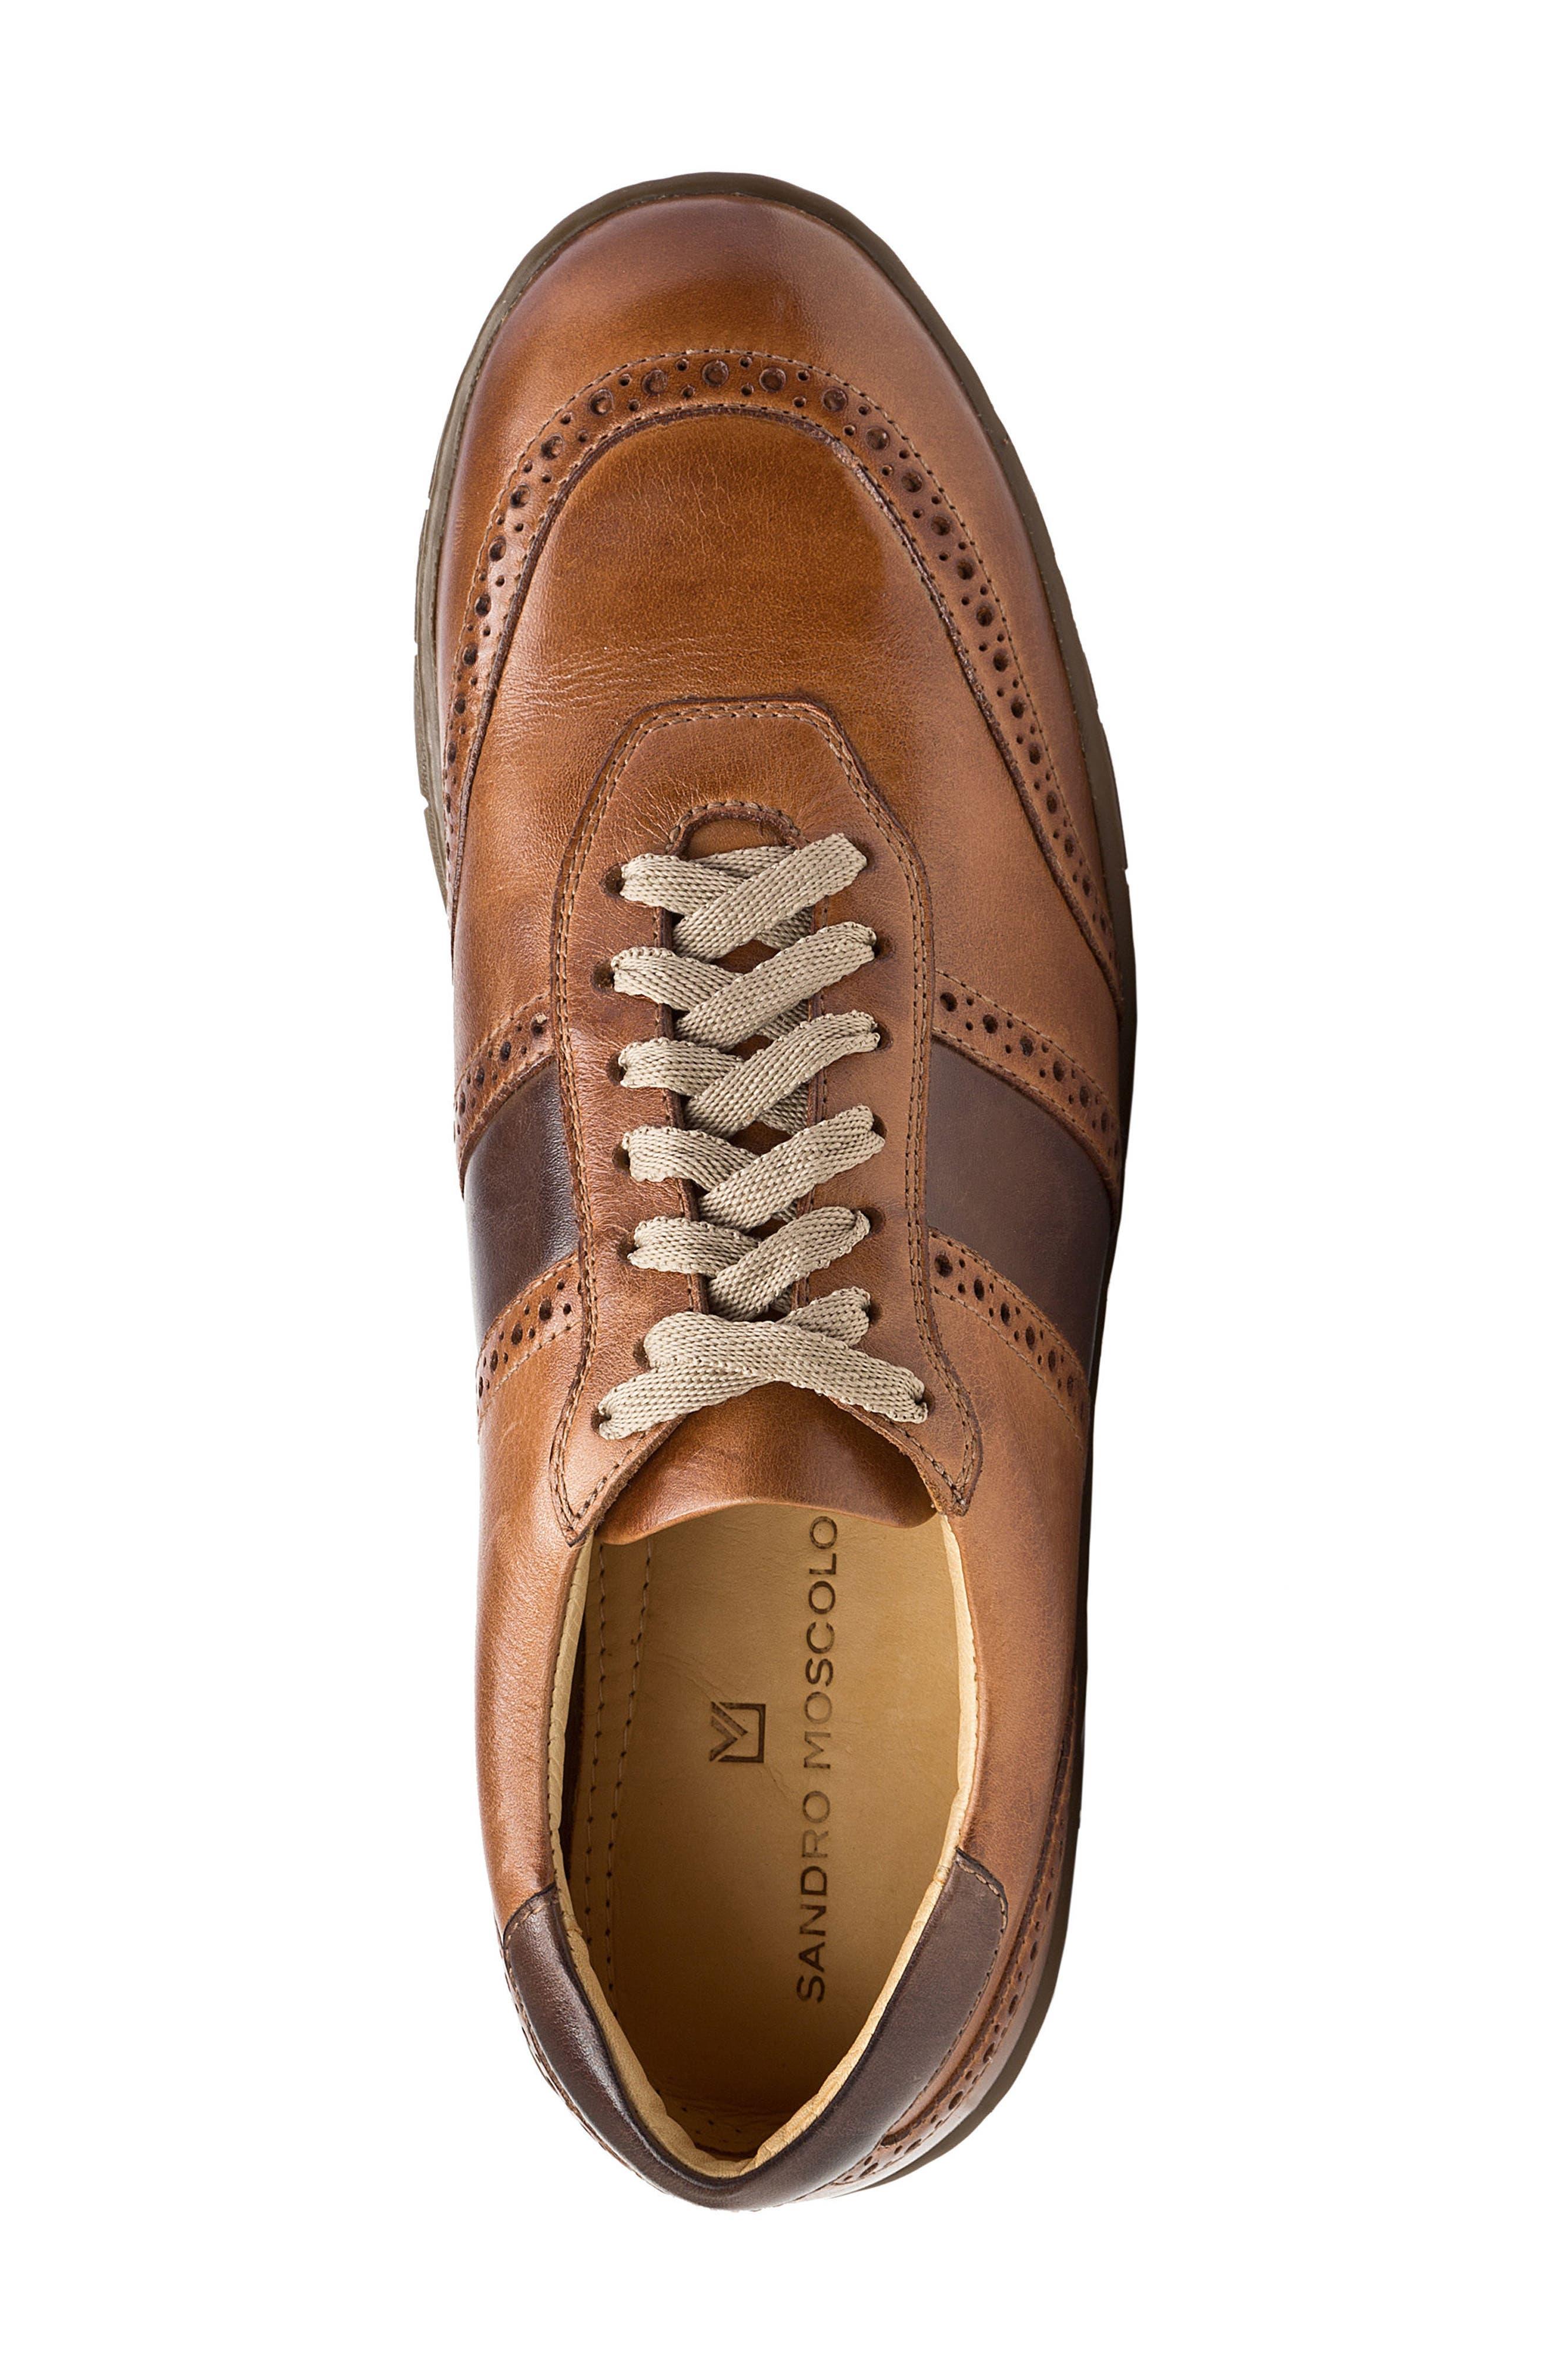 Norris Sneaker,                             Alternate thumbnail 5, color,                             TAN LEATHER